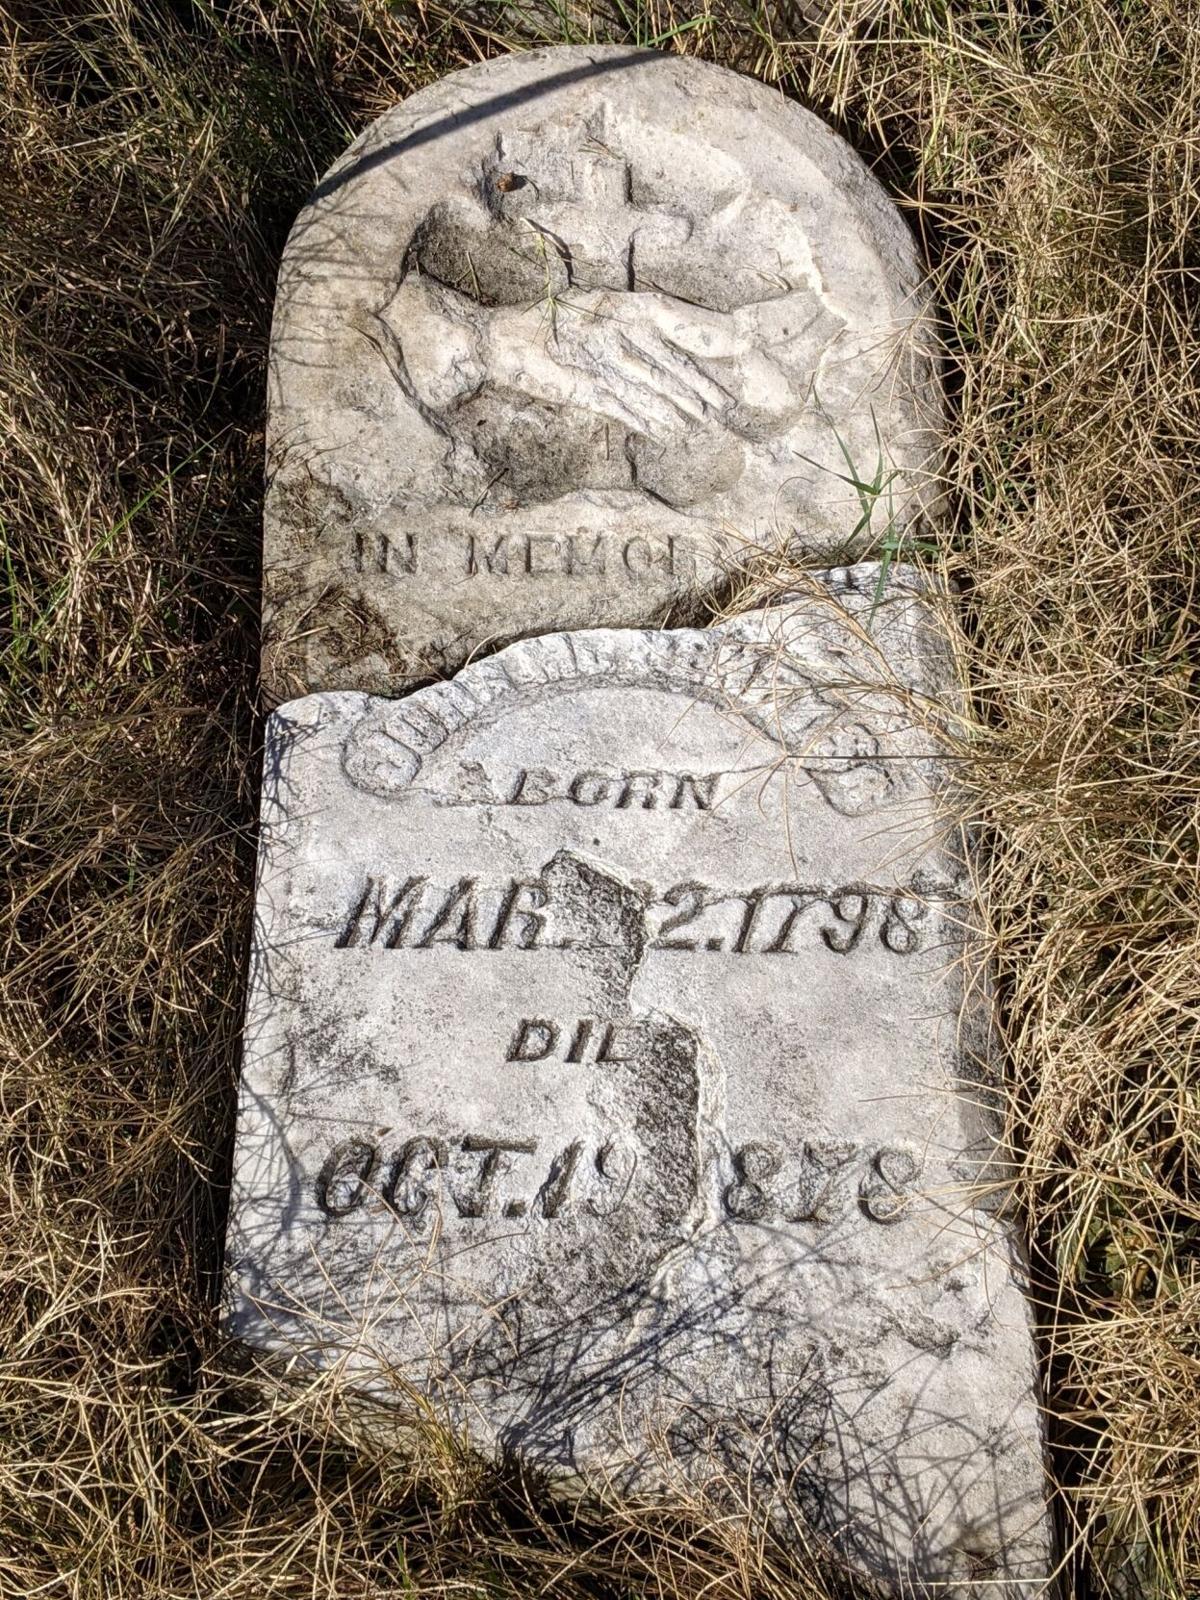 John McHenry's tombstone